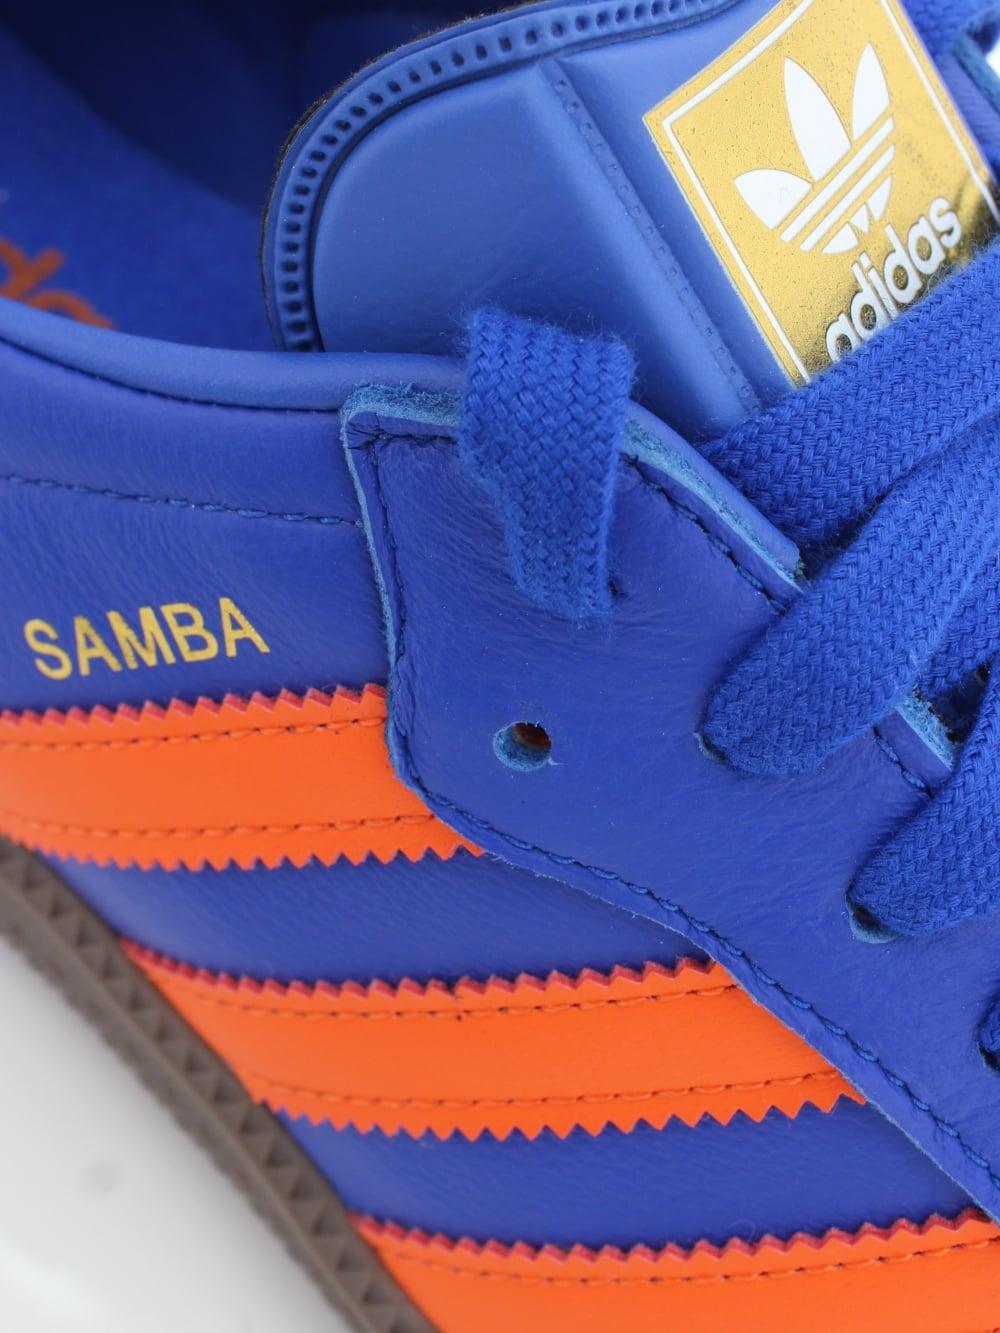 9a76a8c3303da4 adidas Original Samba OG Trainer in Blue Orange - Northern Threads